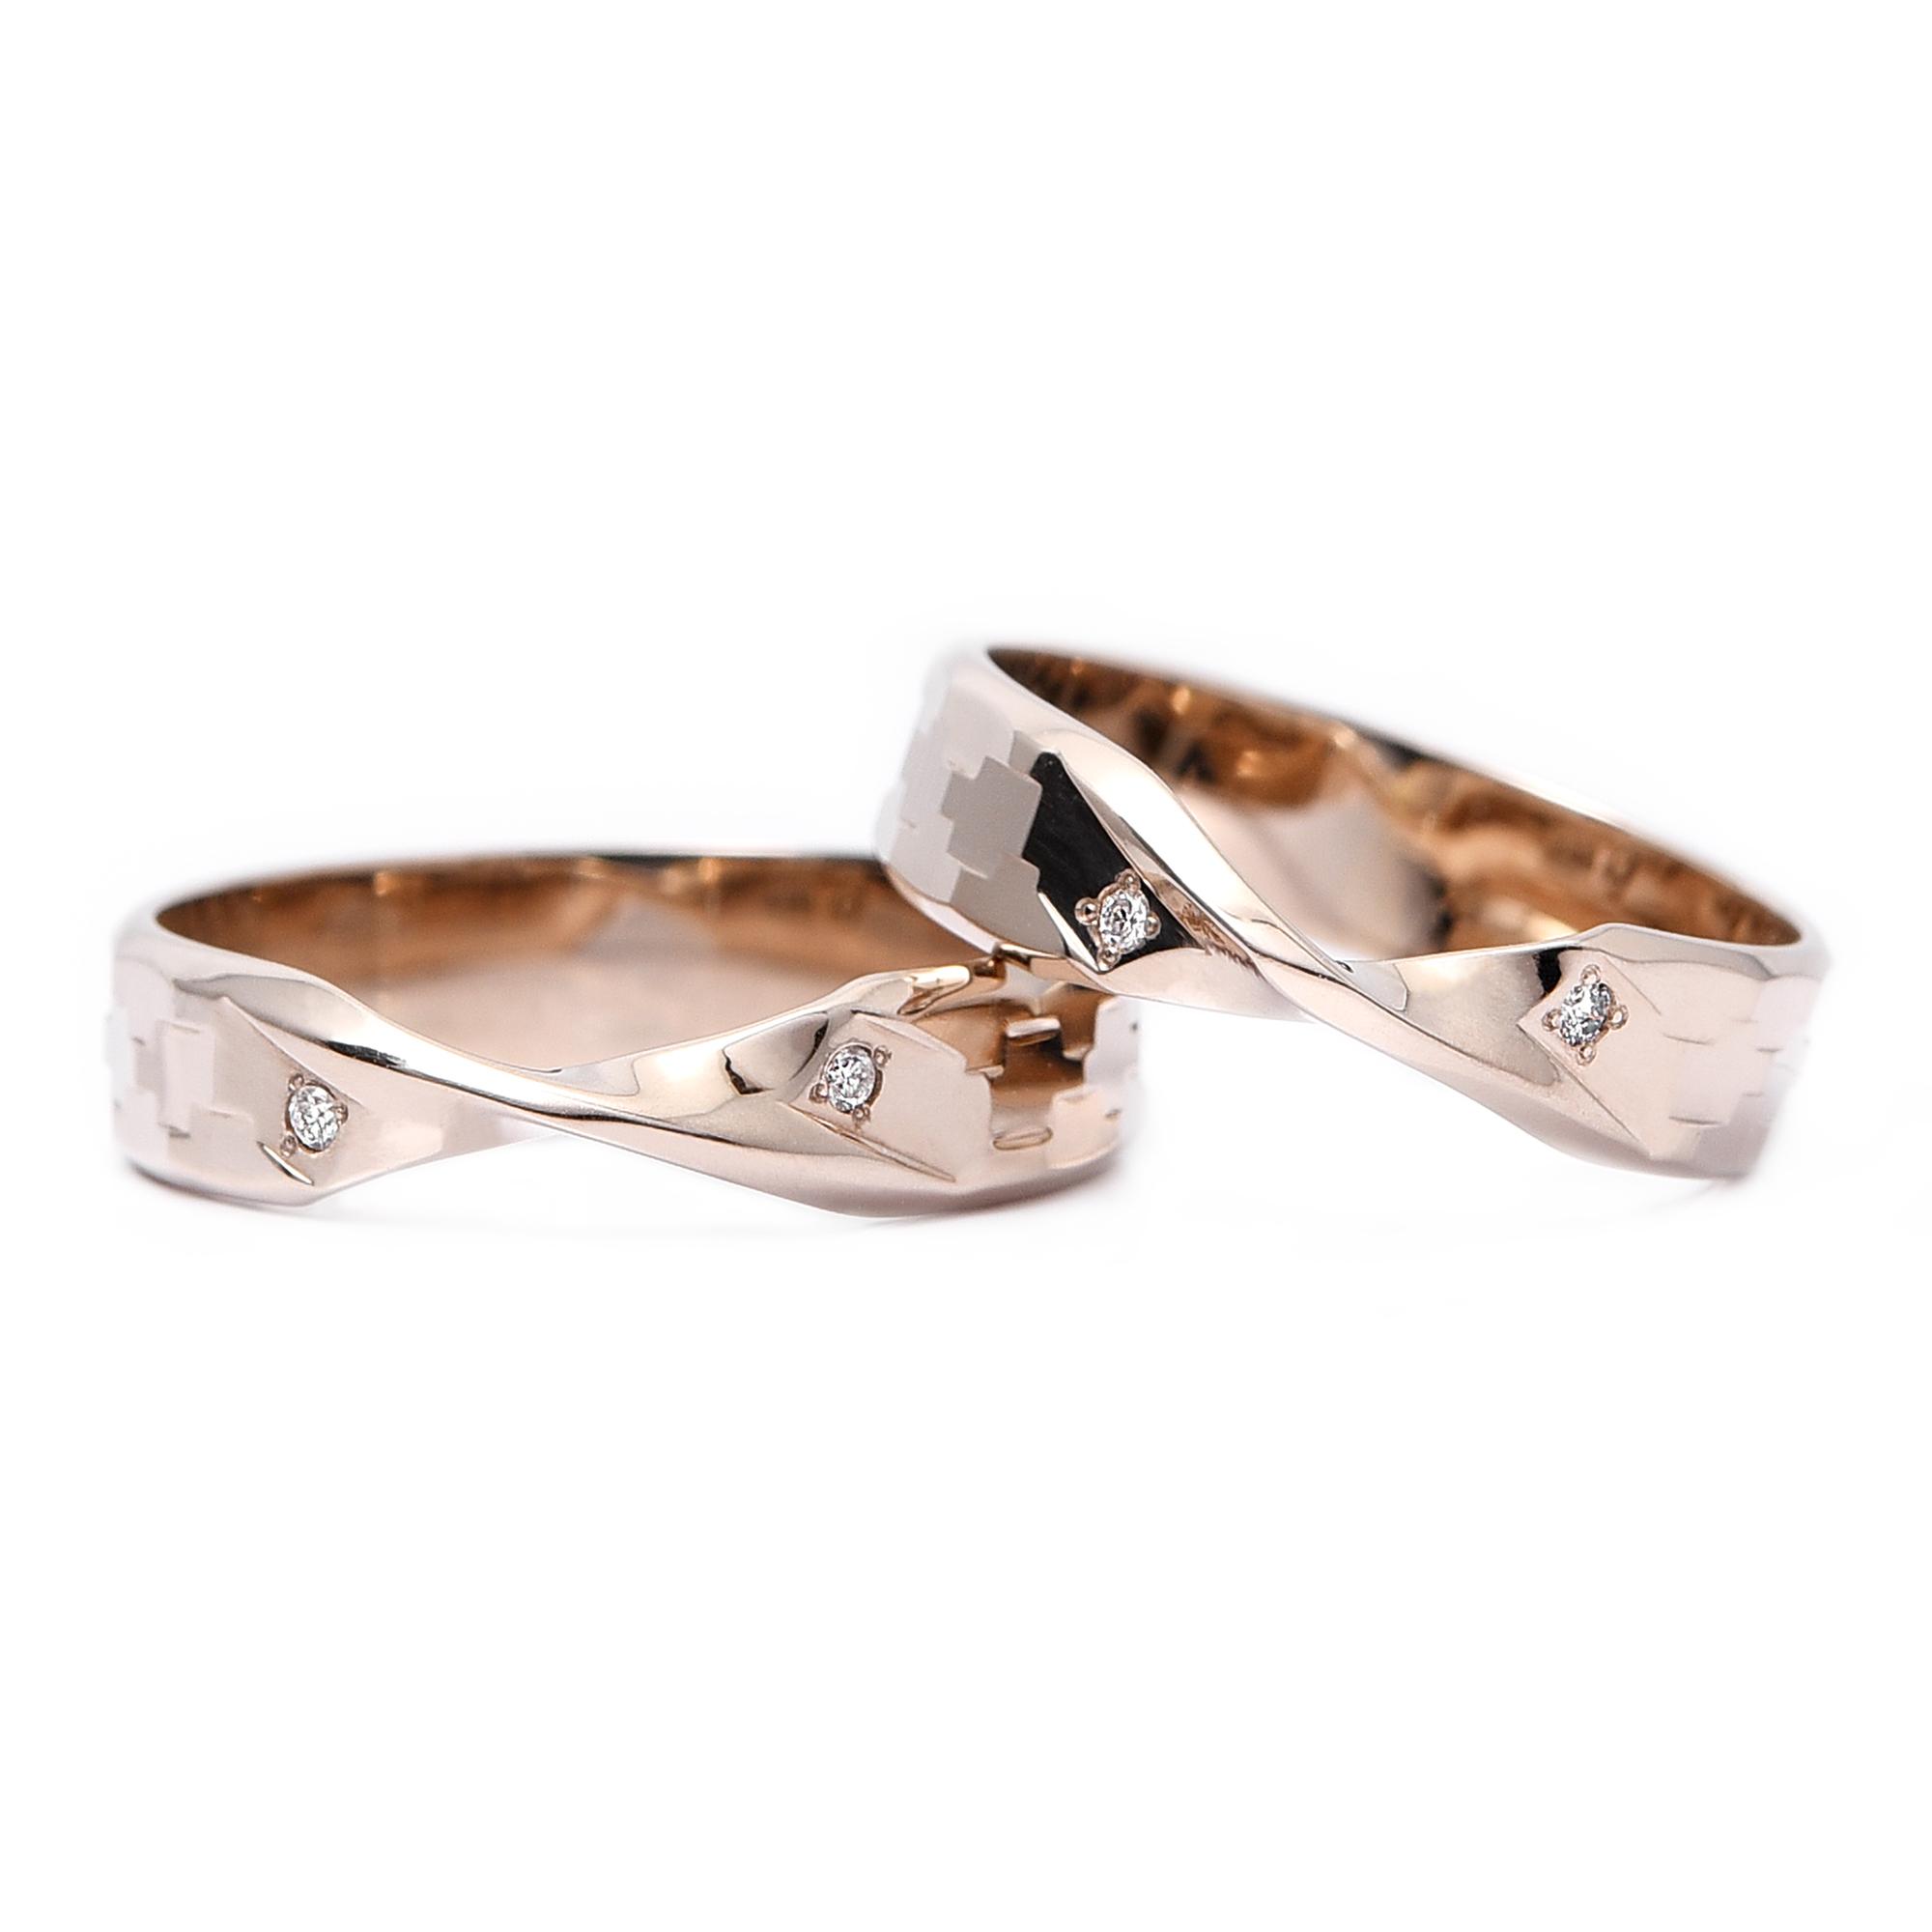 輪高崎工房の結婚指輪|HR-160